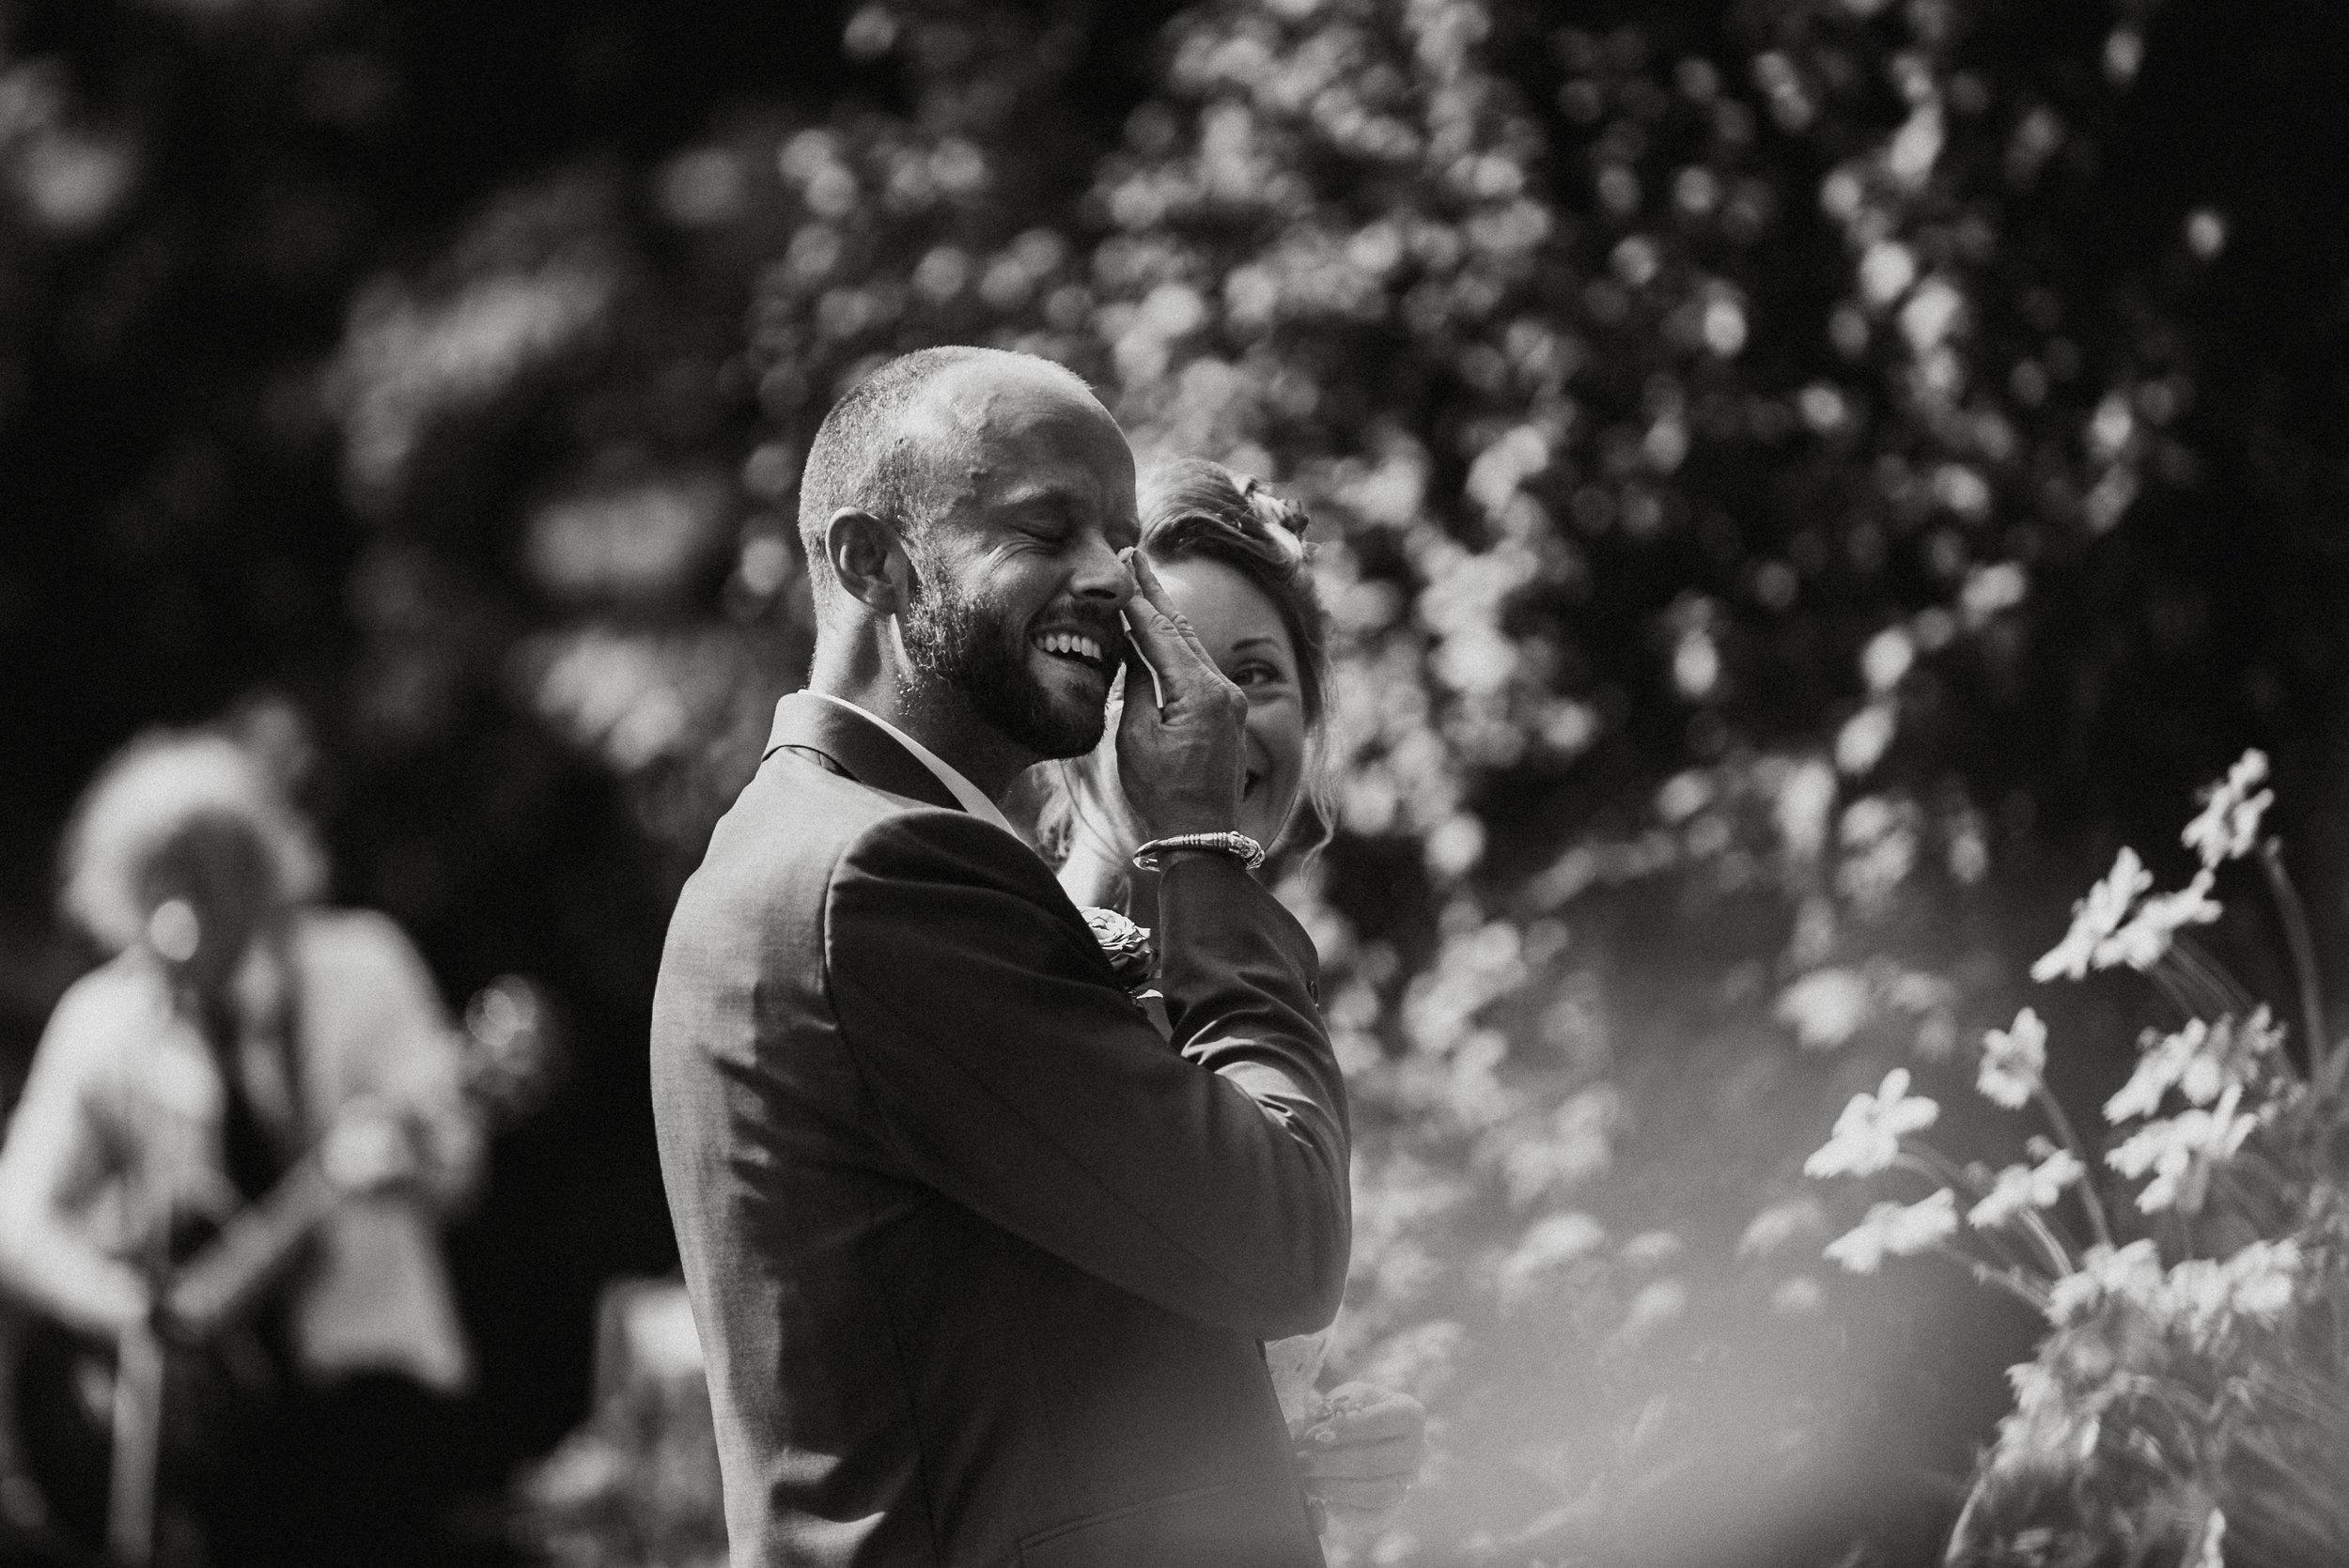 pencarrow-house-wedding-photographer-63.jpg